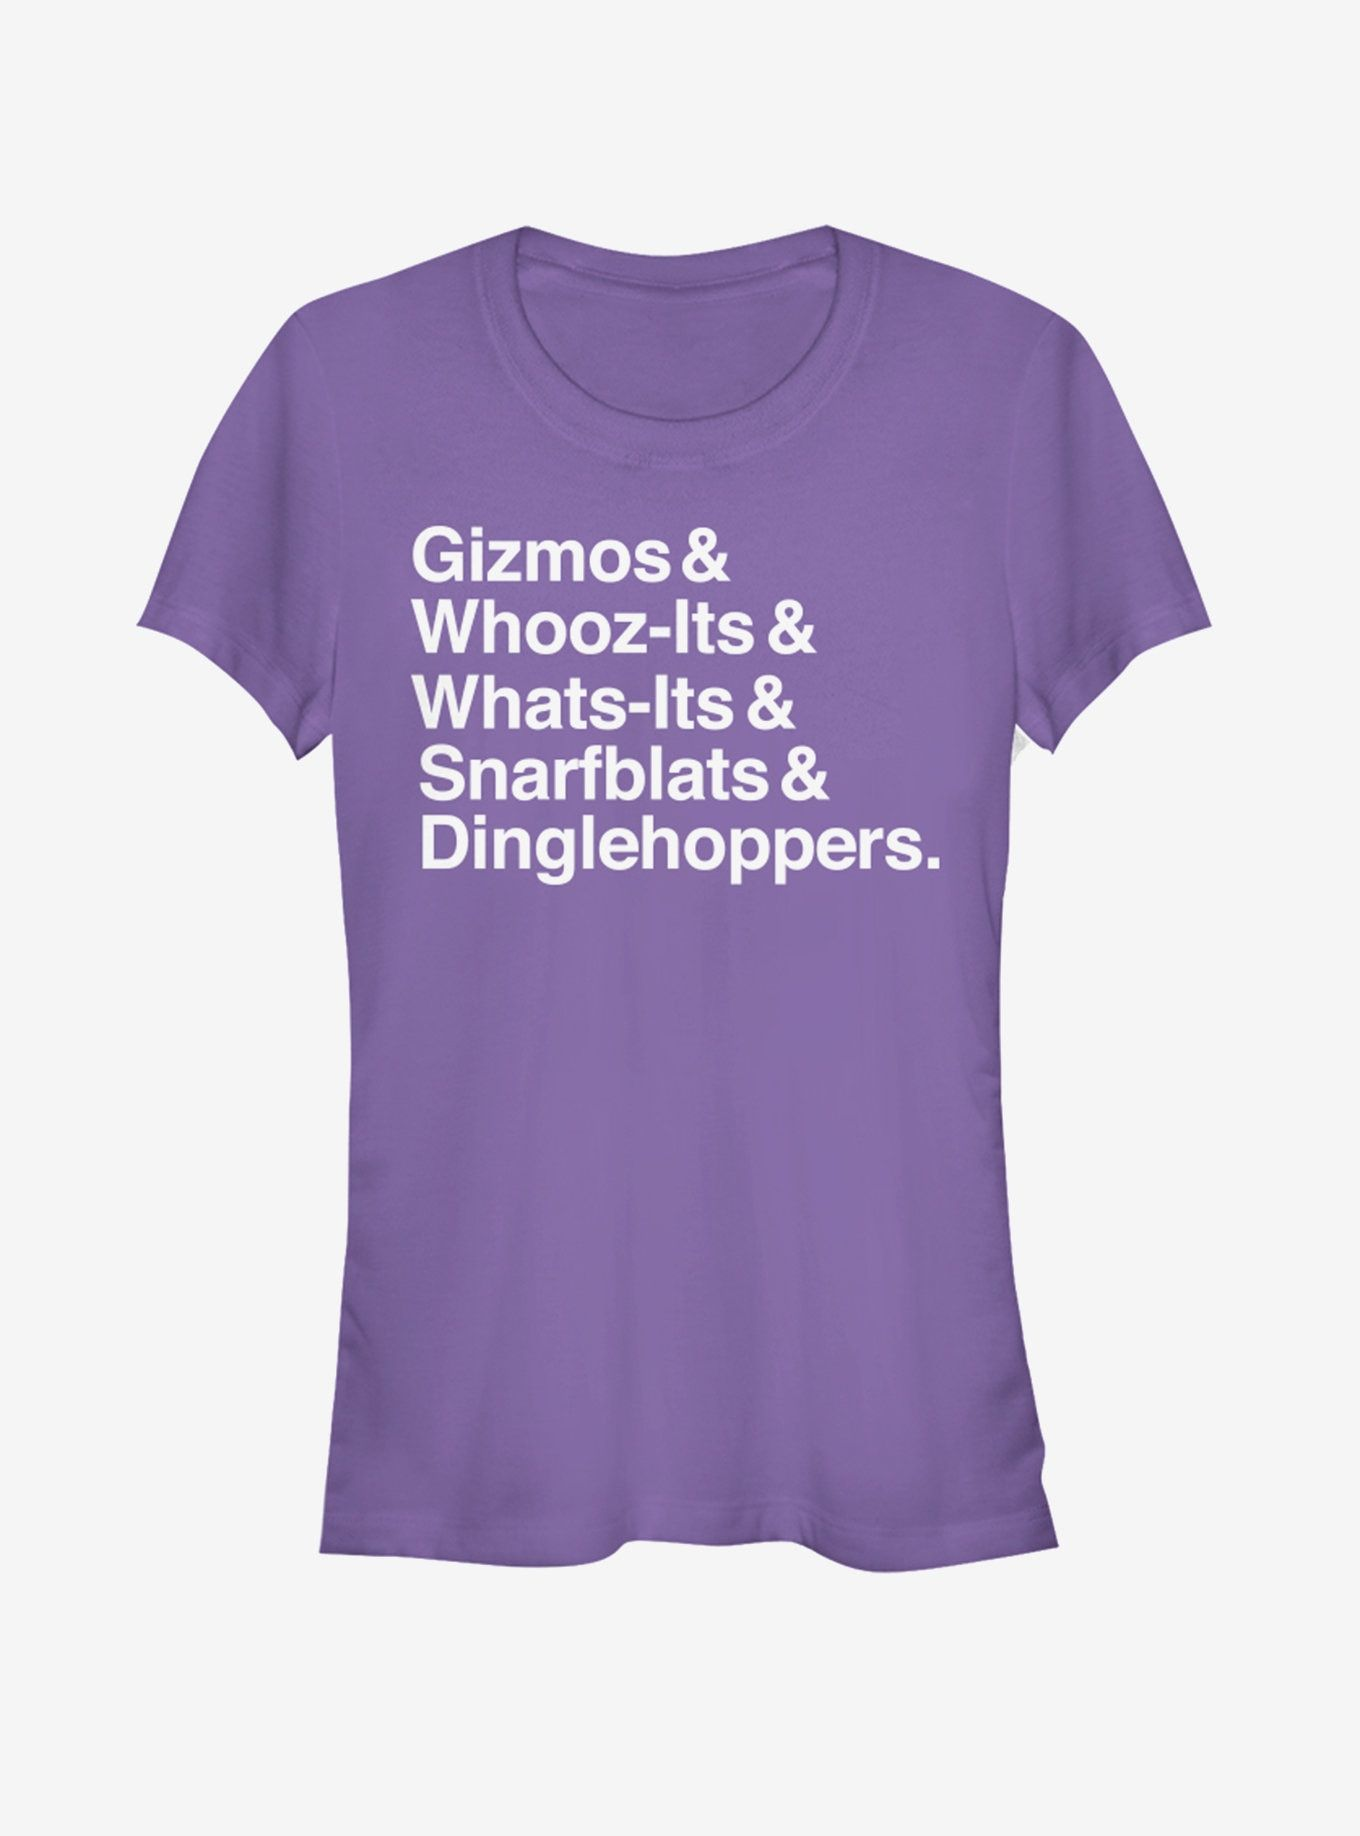 Disney The Little Mermaid List Girls T Shirt In 2020 Little Mermaid Shirt Girls Tshirts The Little Mermaid